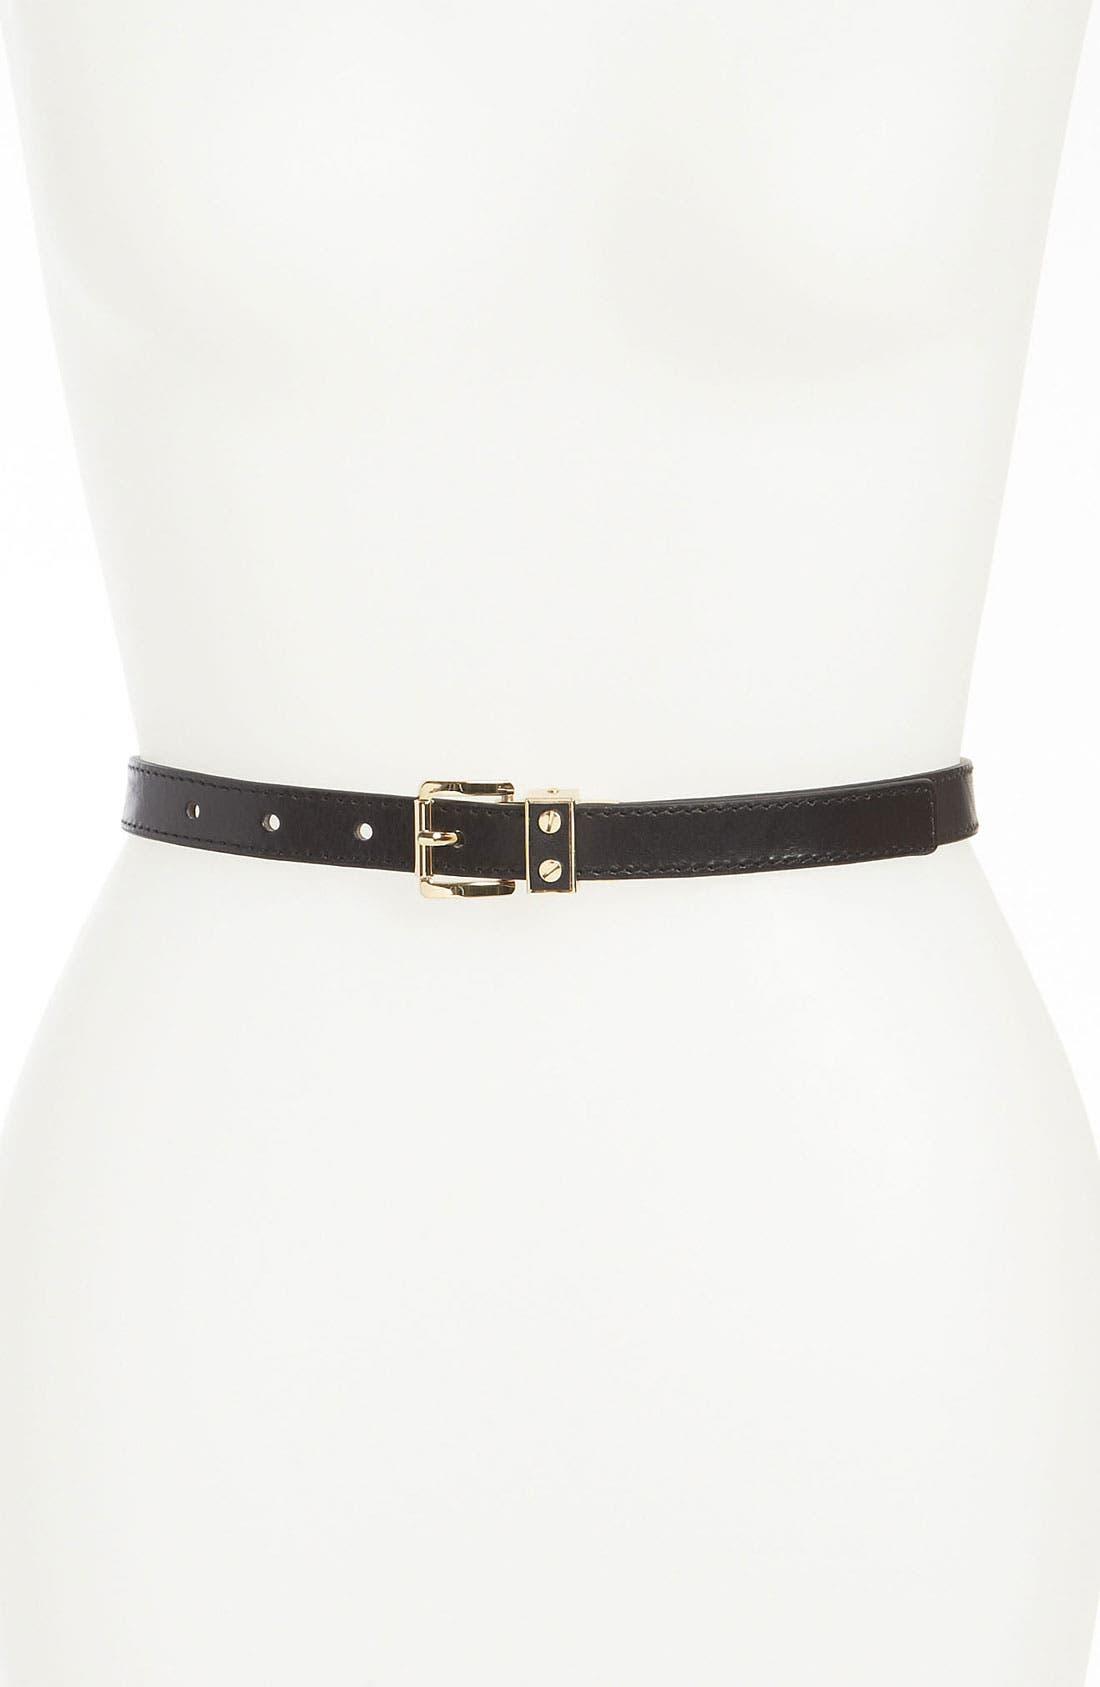 'Screw Buckle' Reversible Leather Belt, Main, color, 001